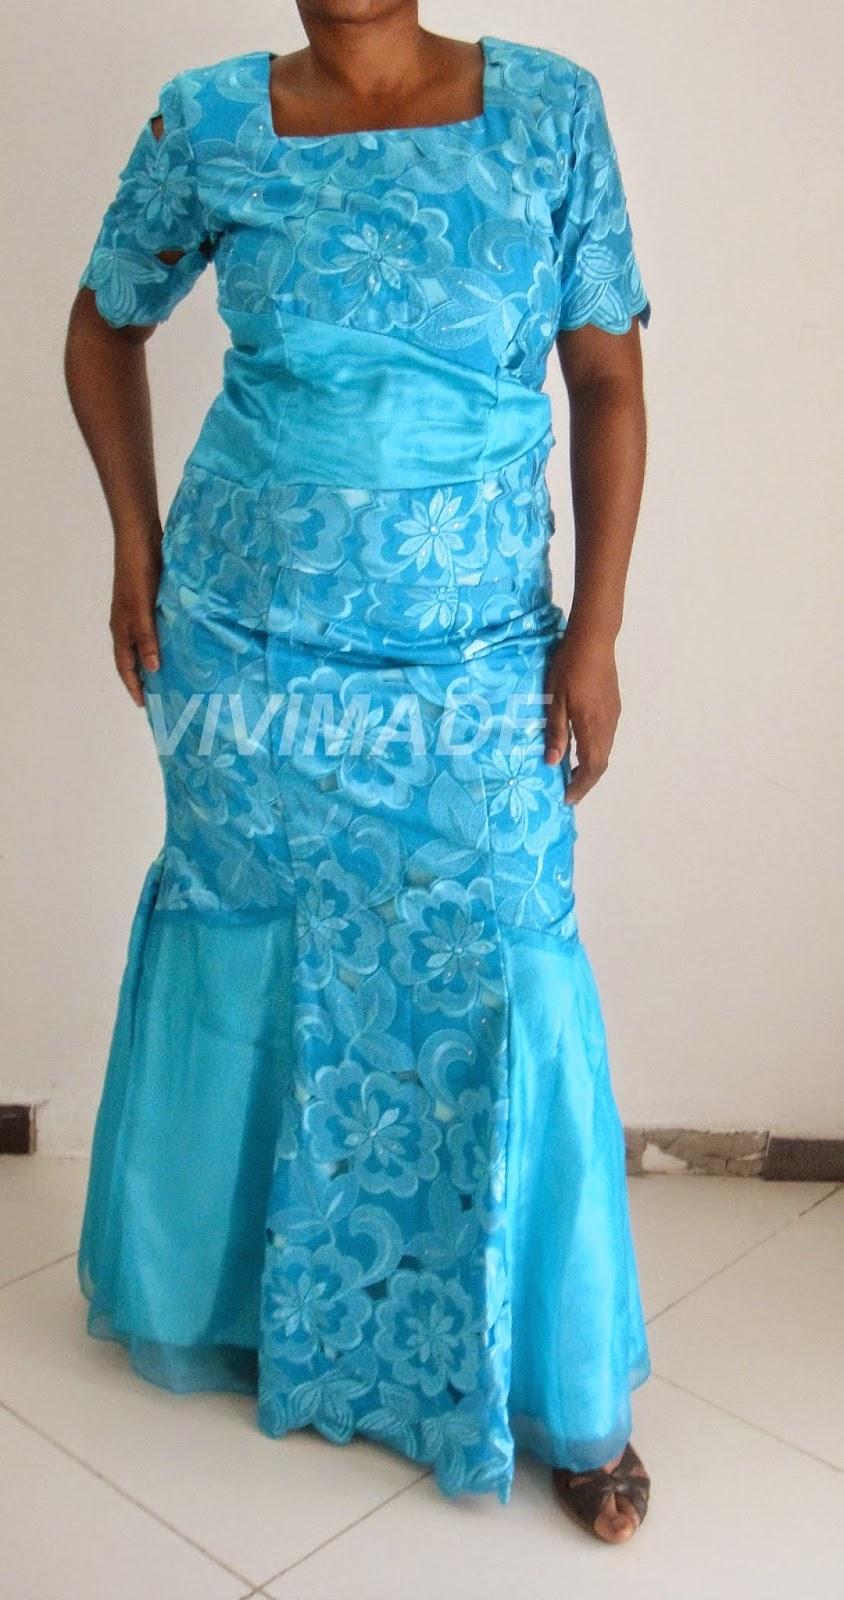 Blue Asoebi : Nigerian wedding guest outfits | Vivimade Creationz